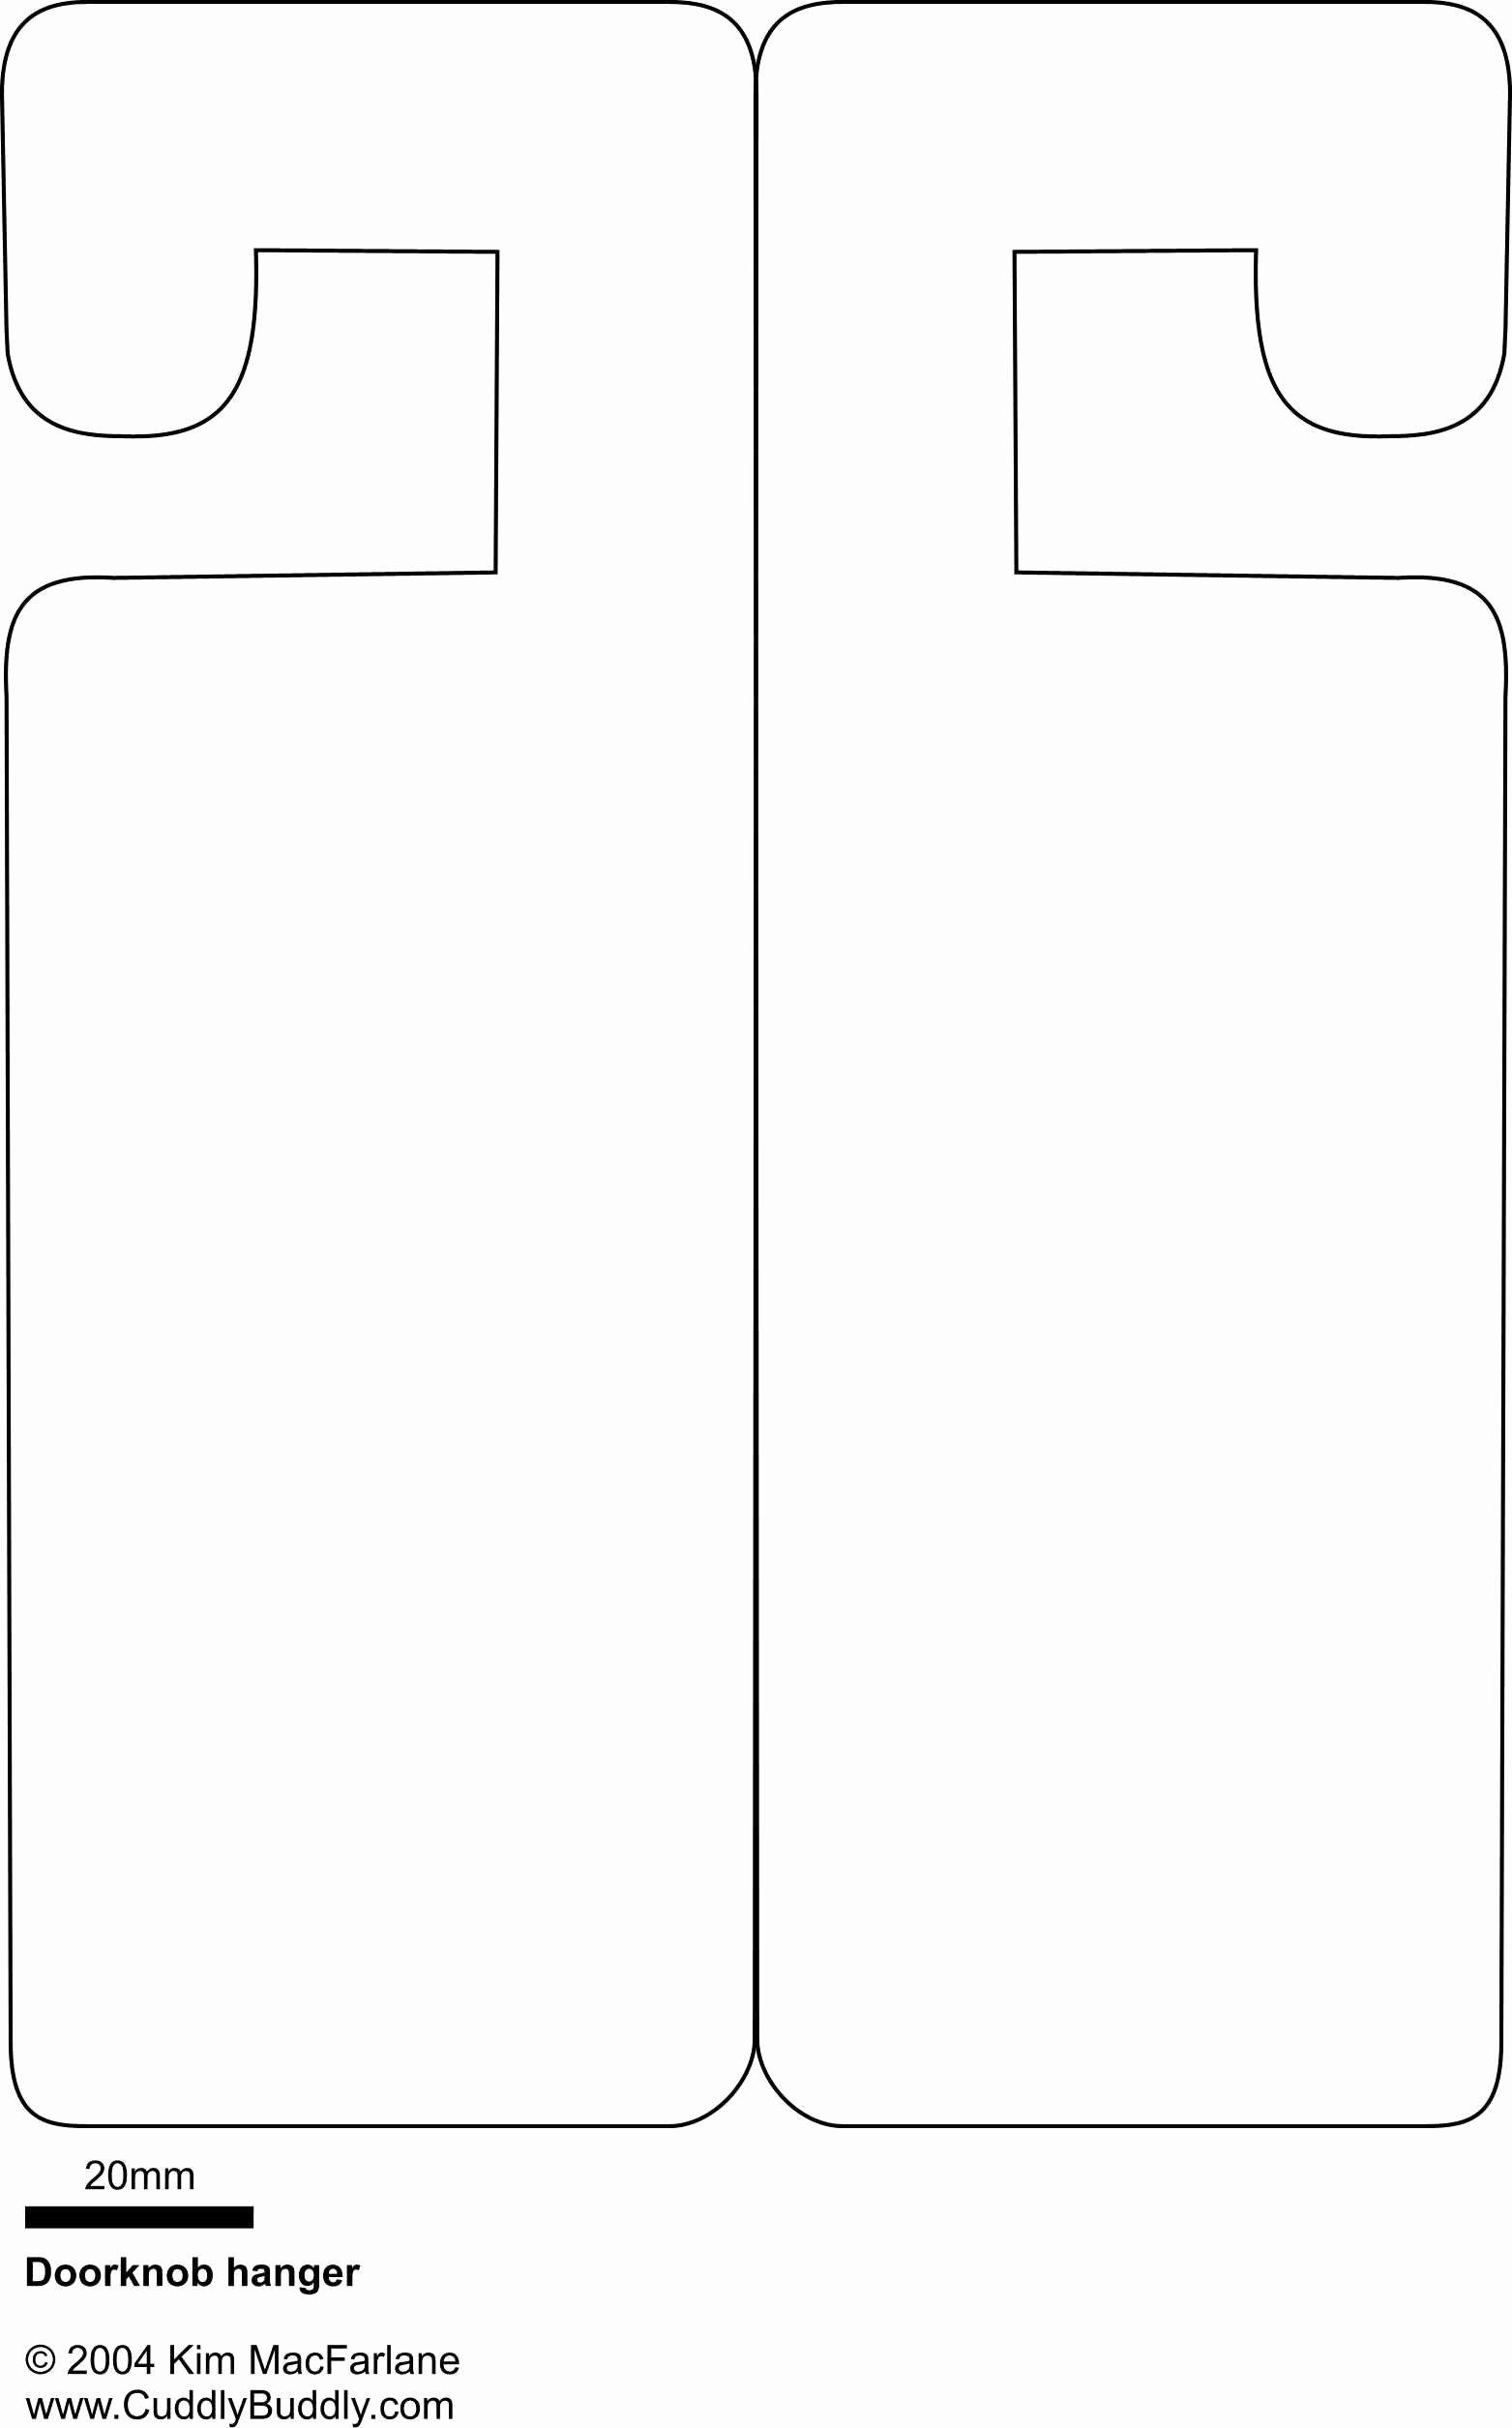 Free Printable Door Hanger Template New Doorknob Hanger Template something to Occupy the Kids On